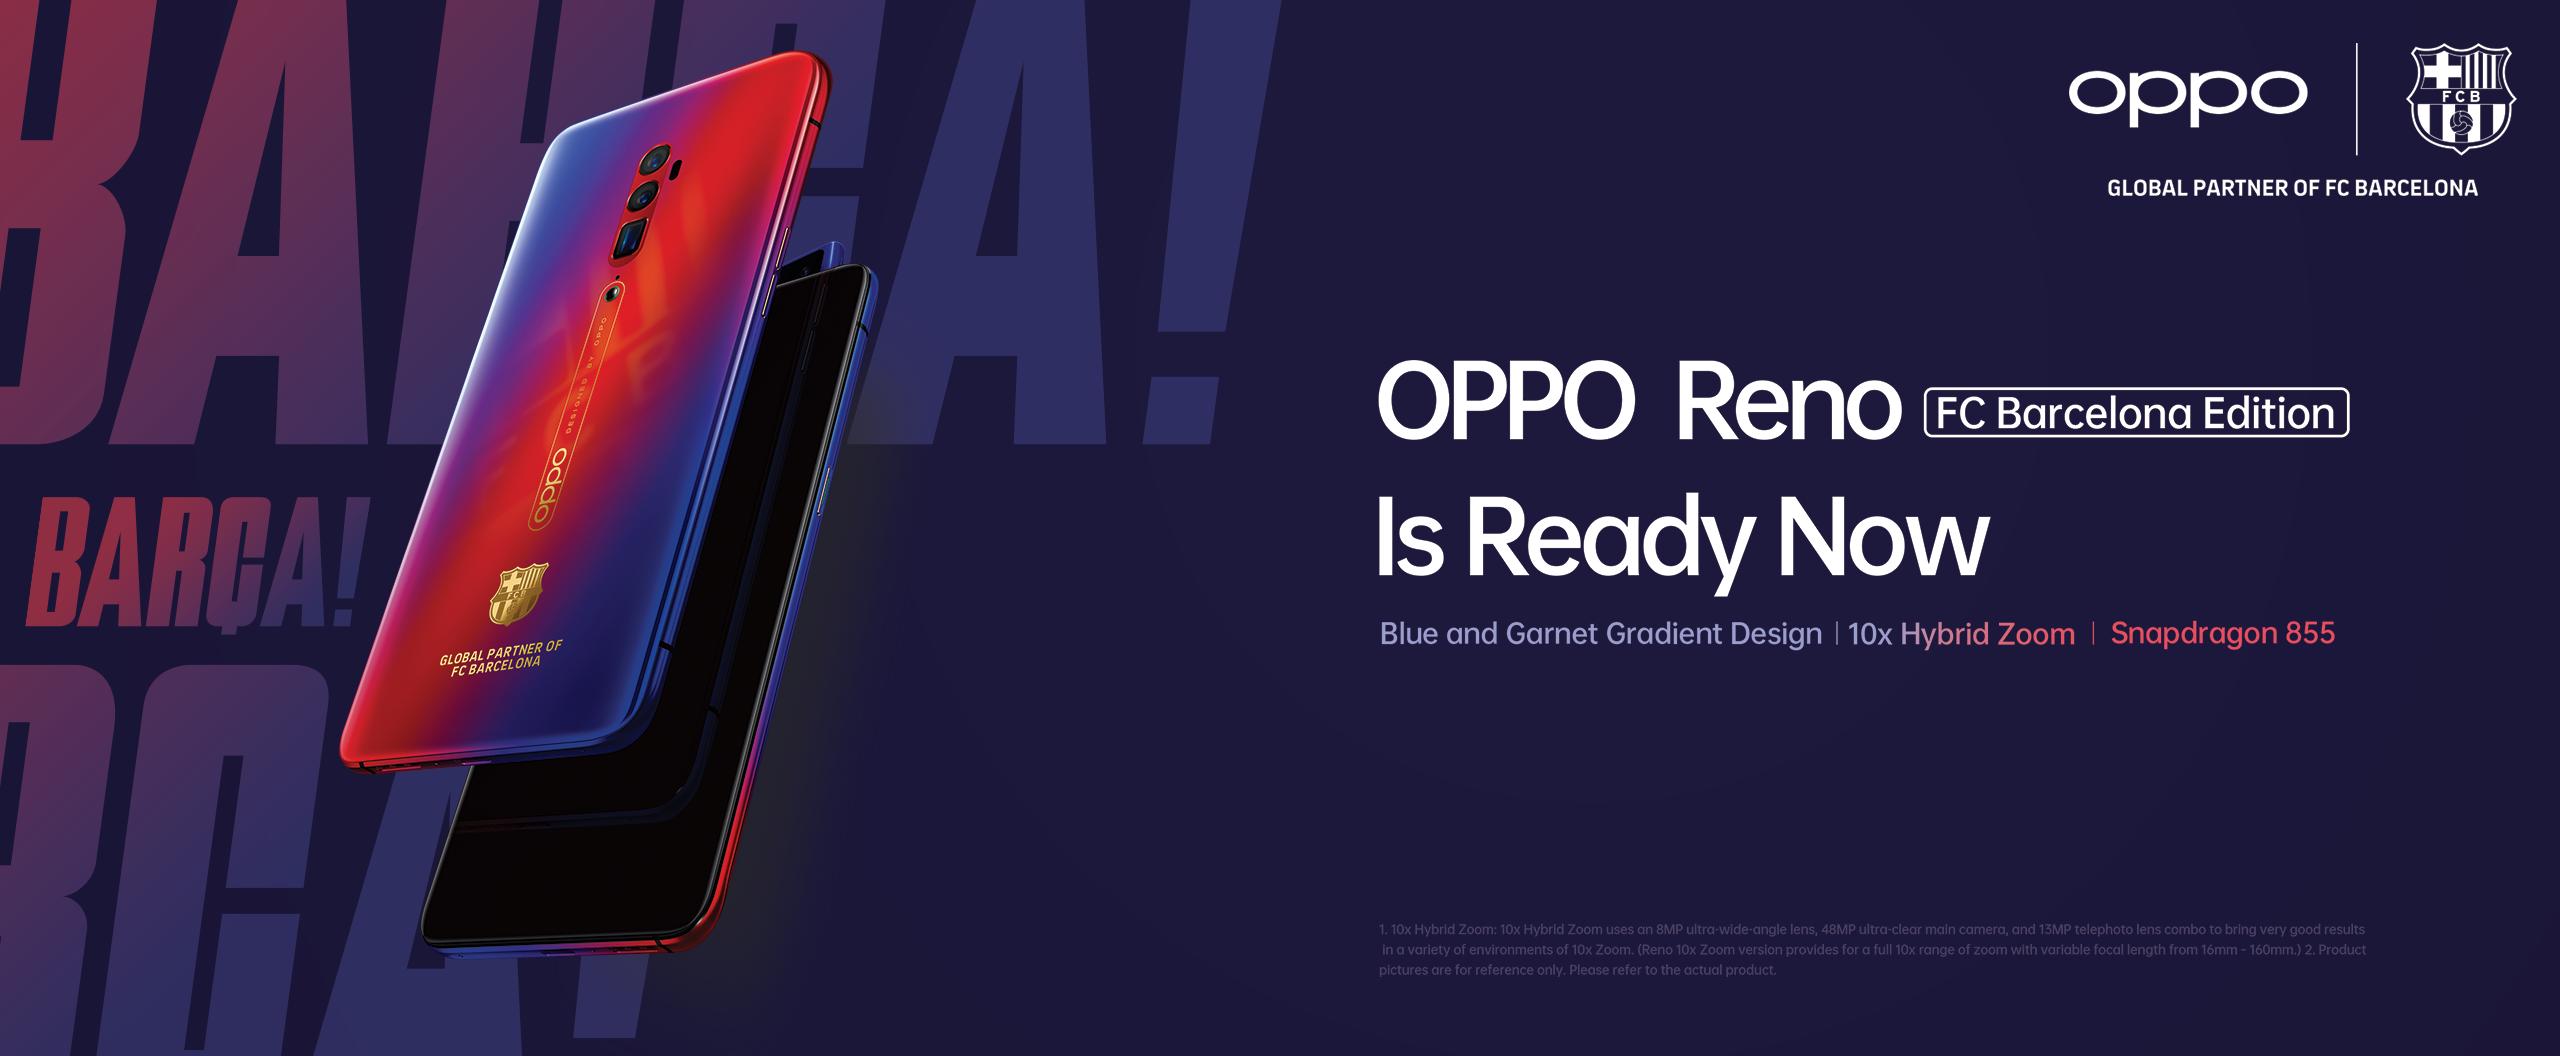 OPPO Camera Phone - OPPO Malaysia | OPPO Malaysia